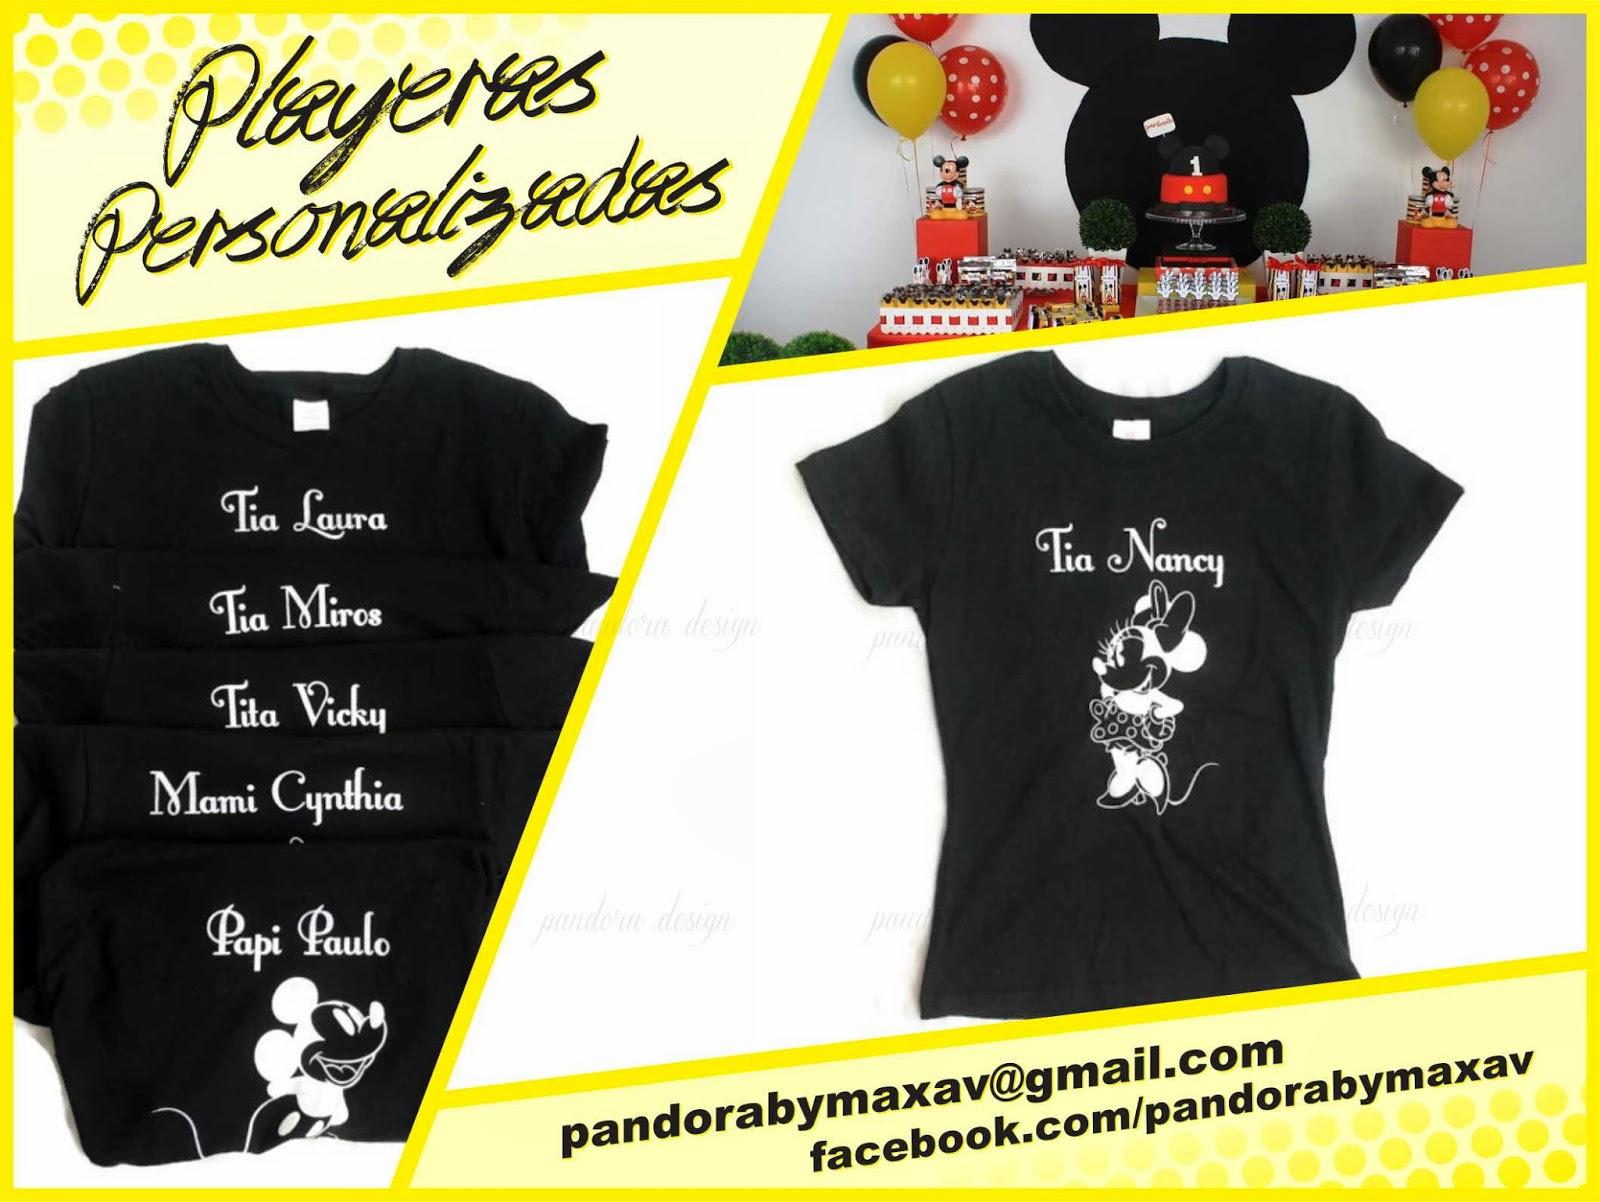 904ca45b9 Playeras personalizadas playeras personalizadas para fiestas infantiles jpg  1600x1202 Camisetas personalizadas para fiestas